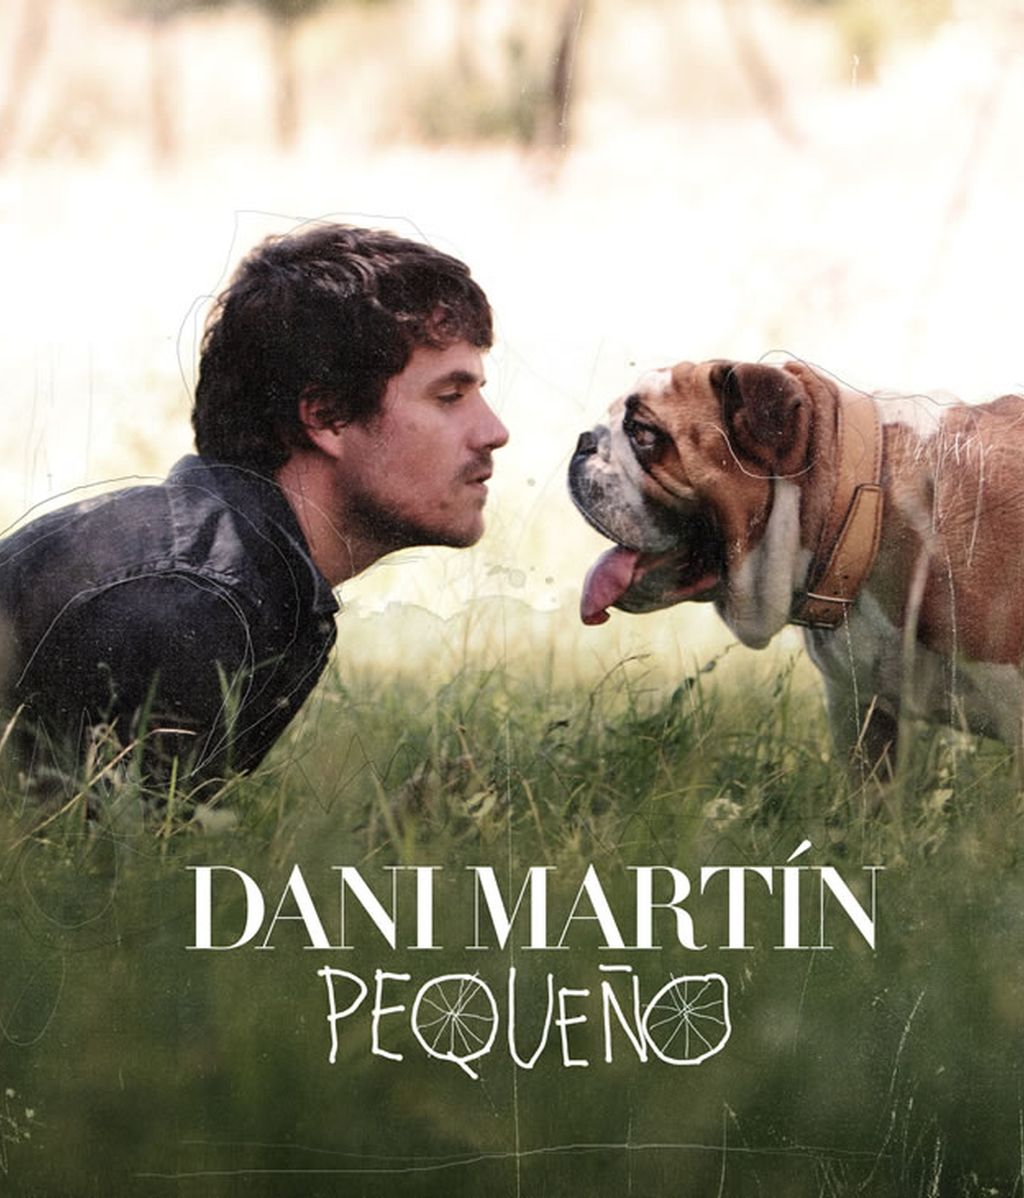 Dani Martin - Pequeño